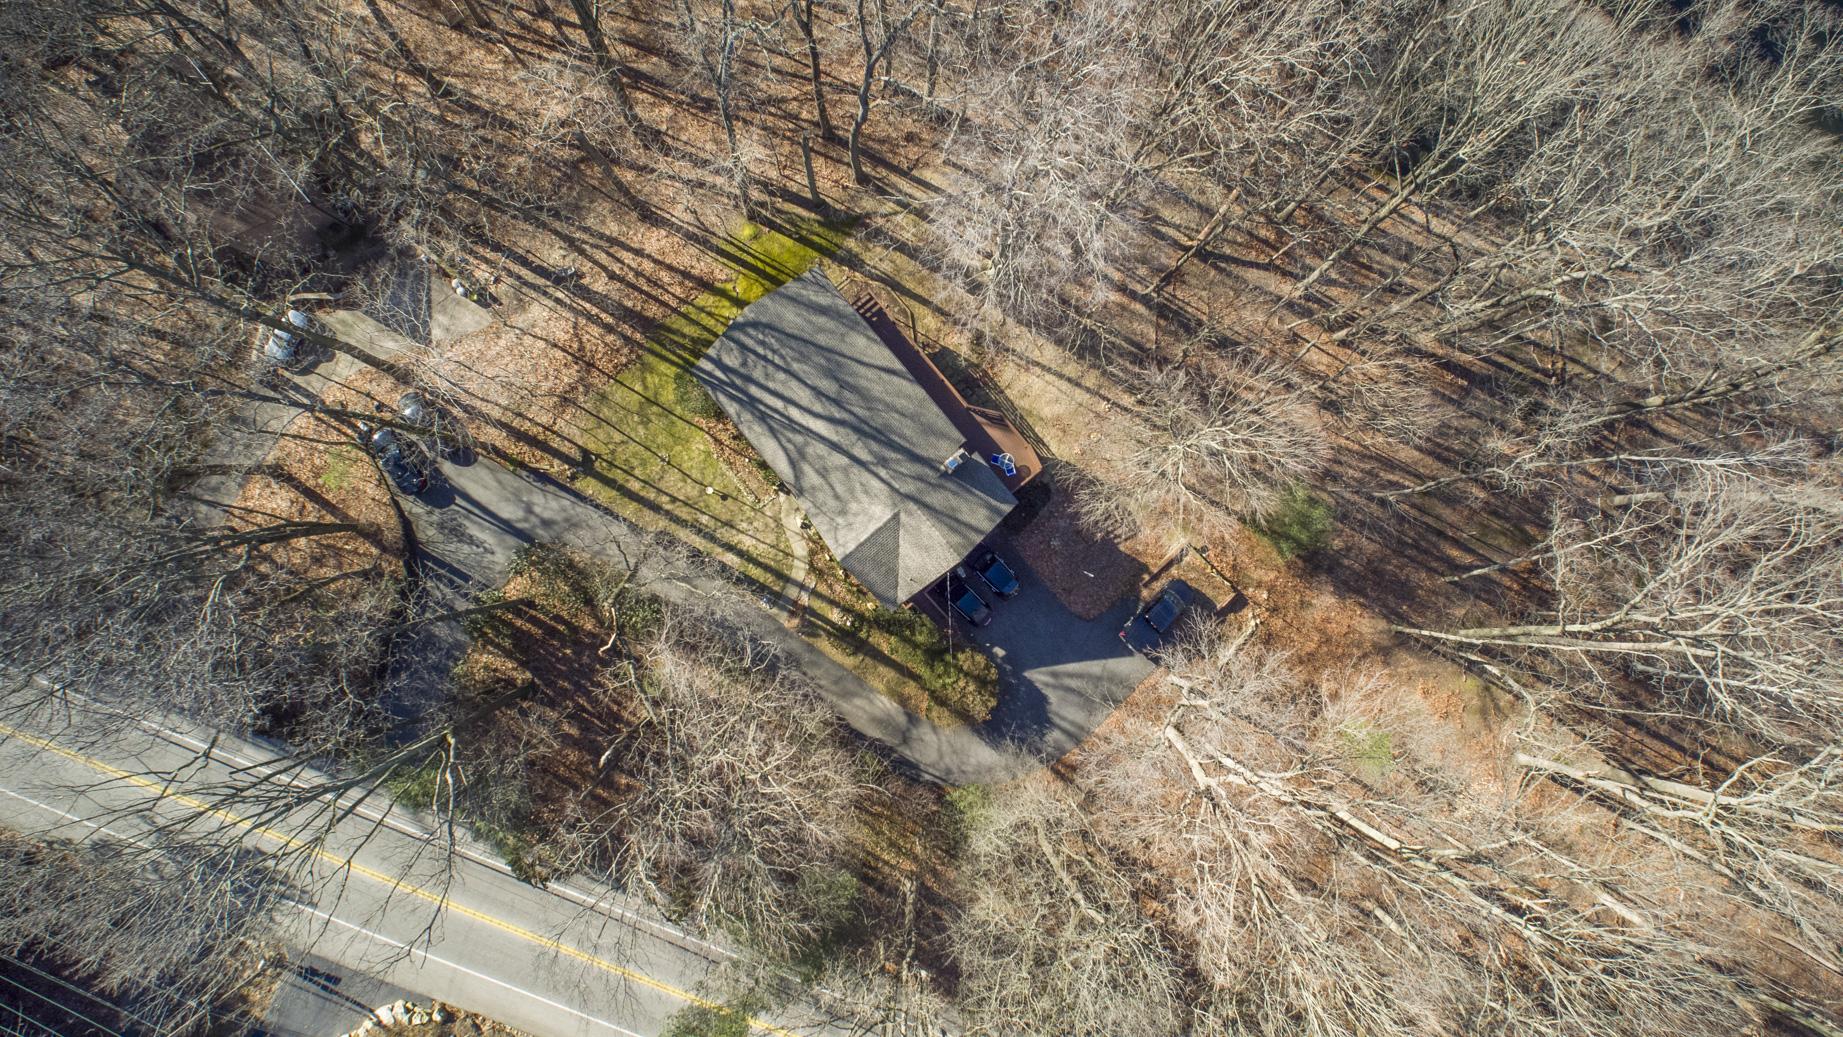 183 Palmers Mill Rd (Drone)2.jpg